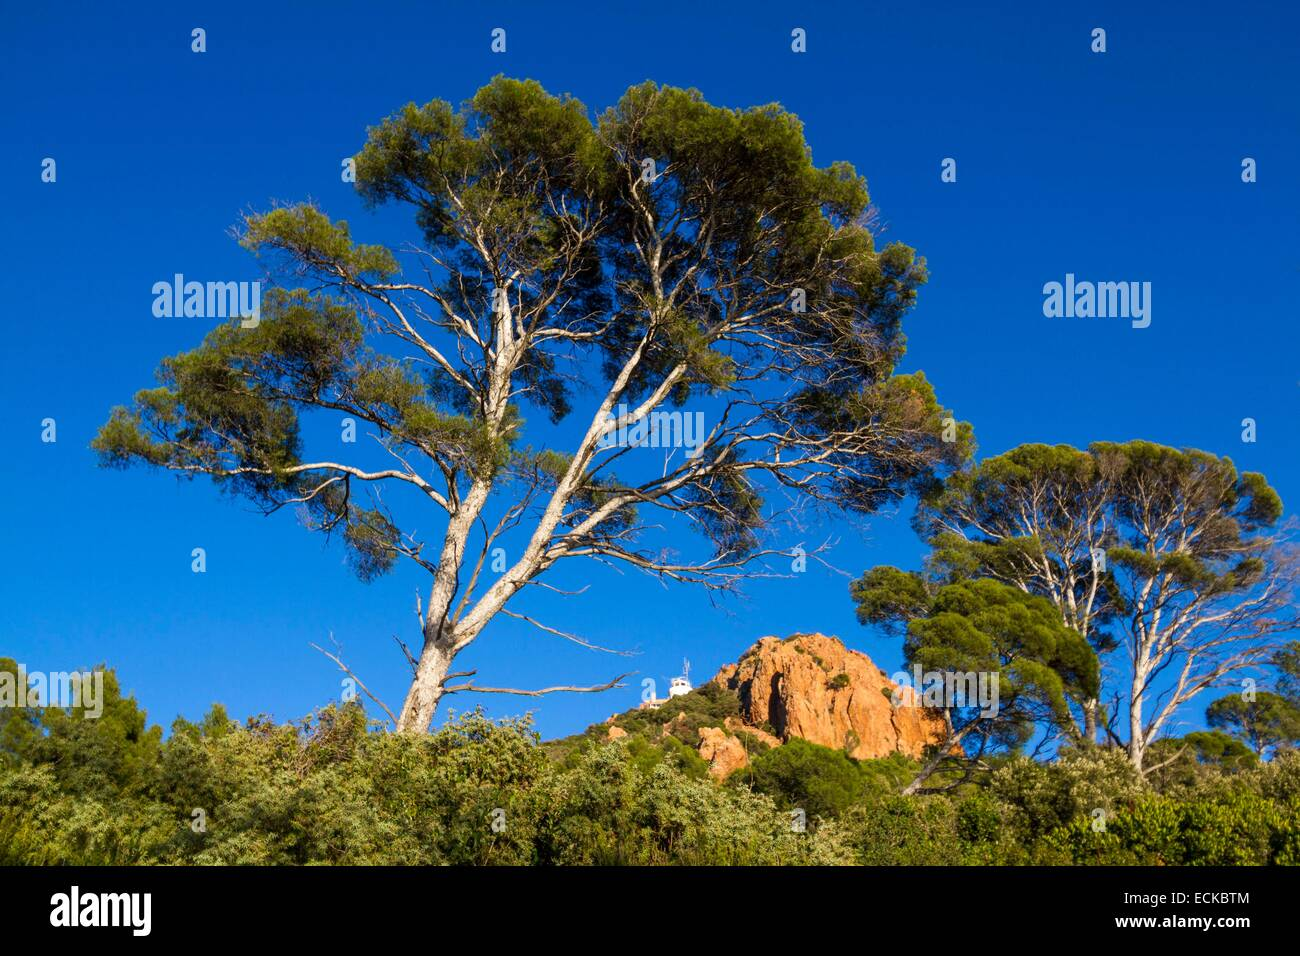 France, Var, Corniche de l'Esterel, Saint Raphael, afforestation of Aleppo Pine (Pinus halepensis) to the Cap - Stock Image